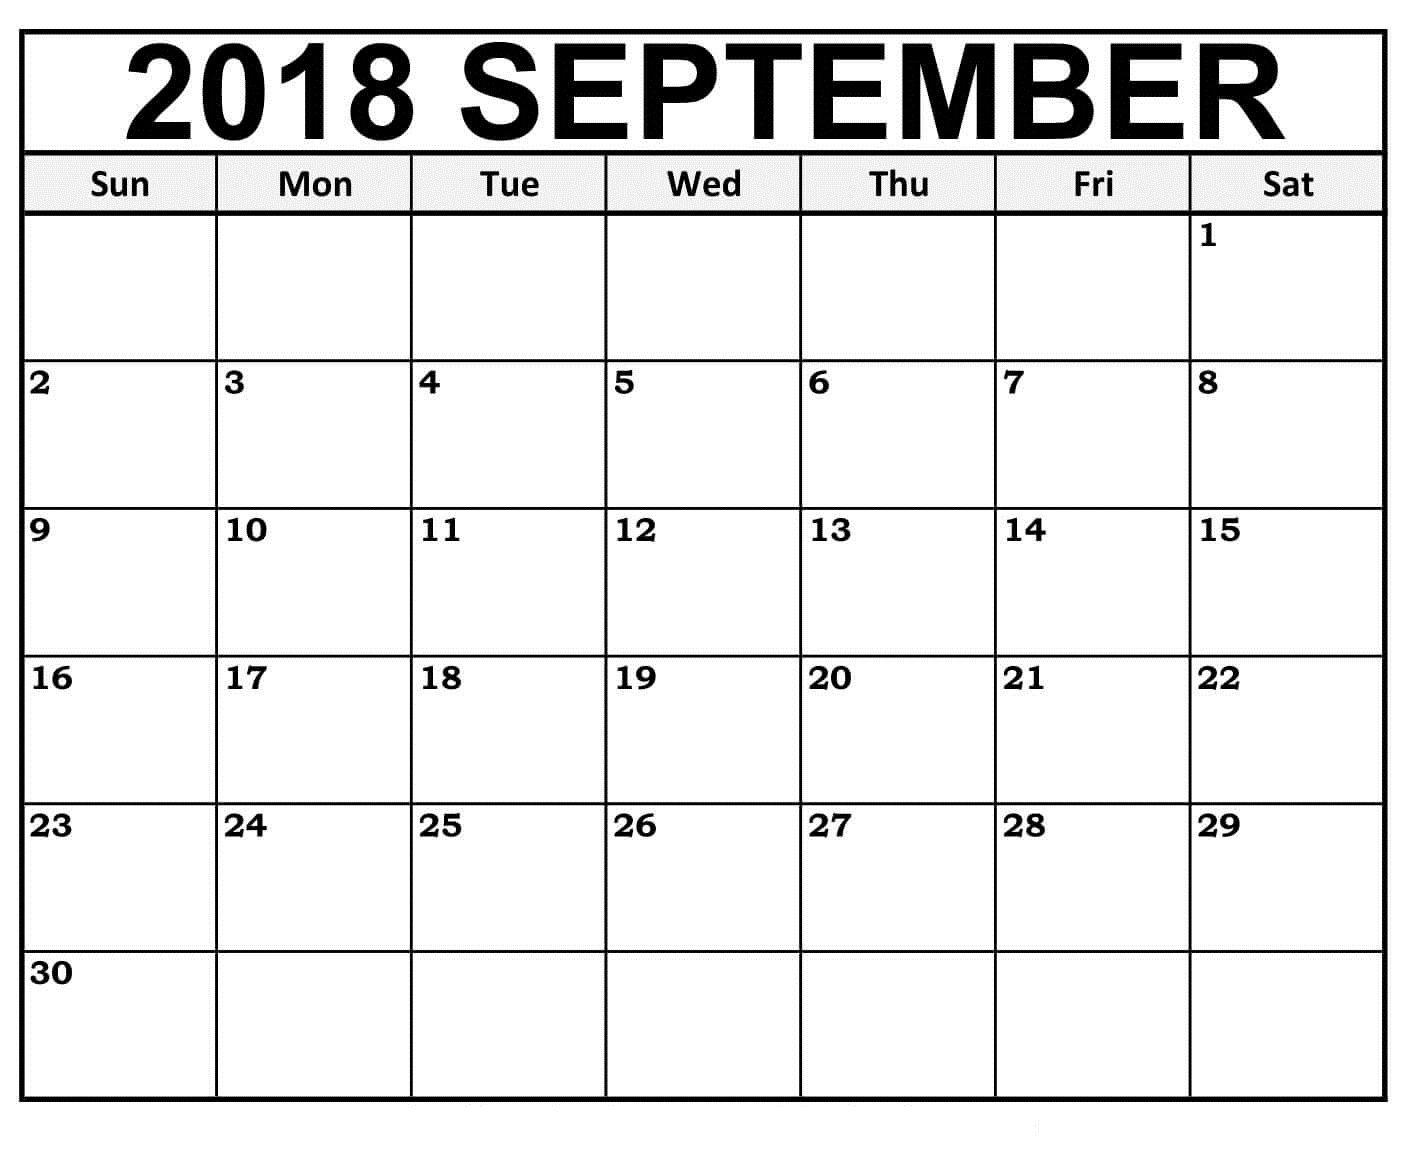 2018 September Calendar Word Document Format Easily Use For Office Purpose Calendar 2019 Printable Calendar Printables June 2019 Calendar